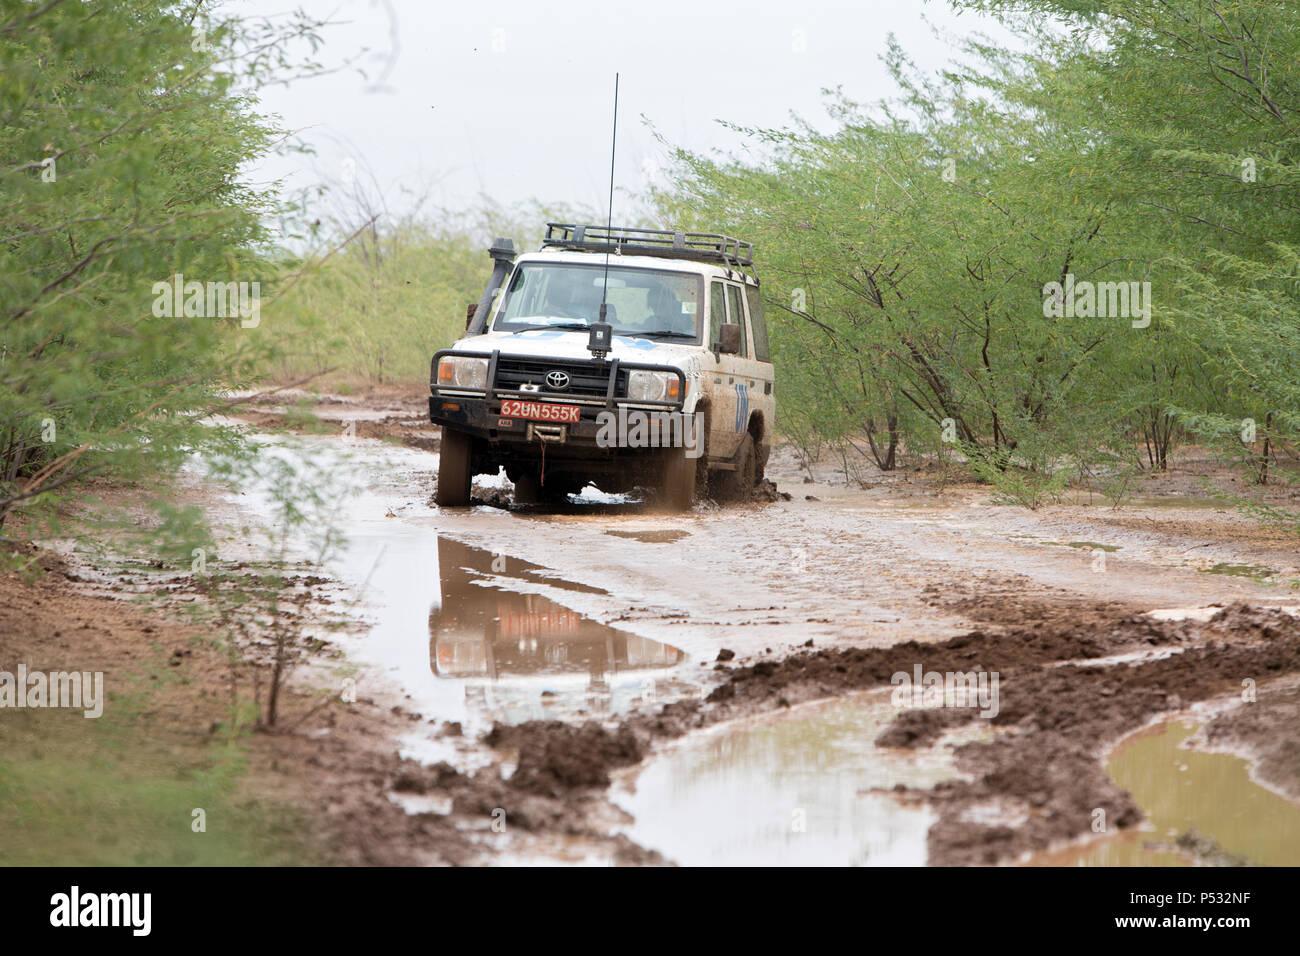 KAKUMA, KENYA - A UN Land Rover drives on a rain-soaked country lane. - Stock Image